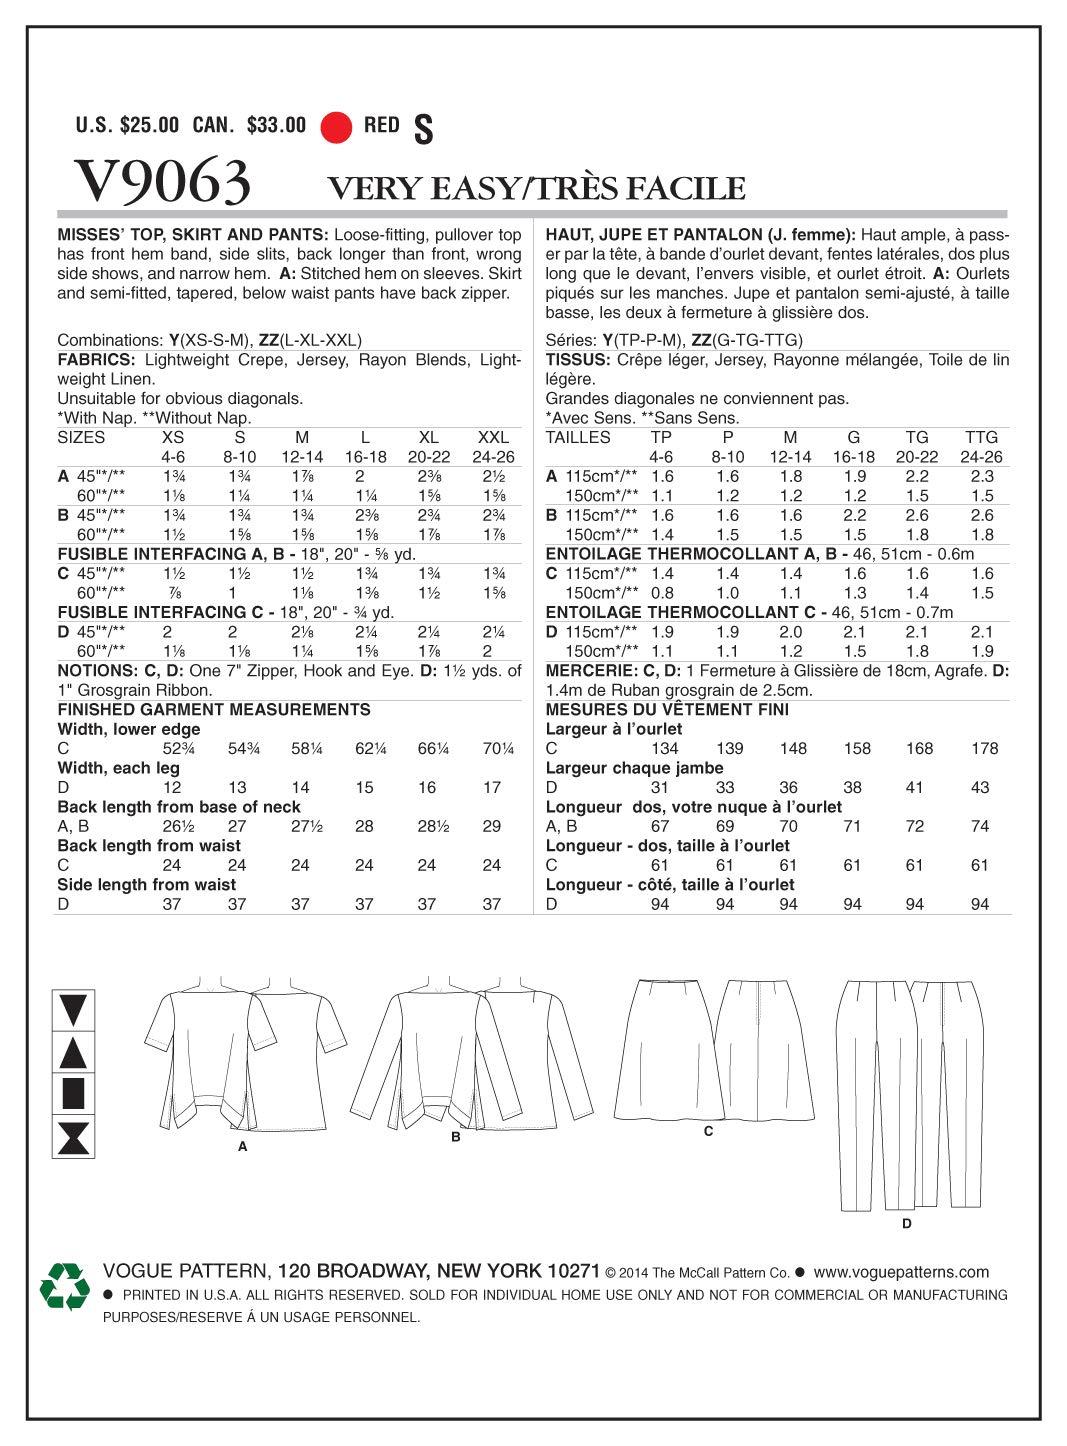 Vogue V9063 costura para confeccionar blusas, trajes, vestidos, moda, VGE 9063 ZZ (LRG-XXL) Deu. Gr. 42-50: Amazon.es: Hogar